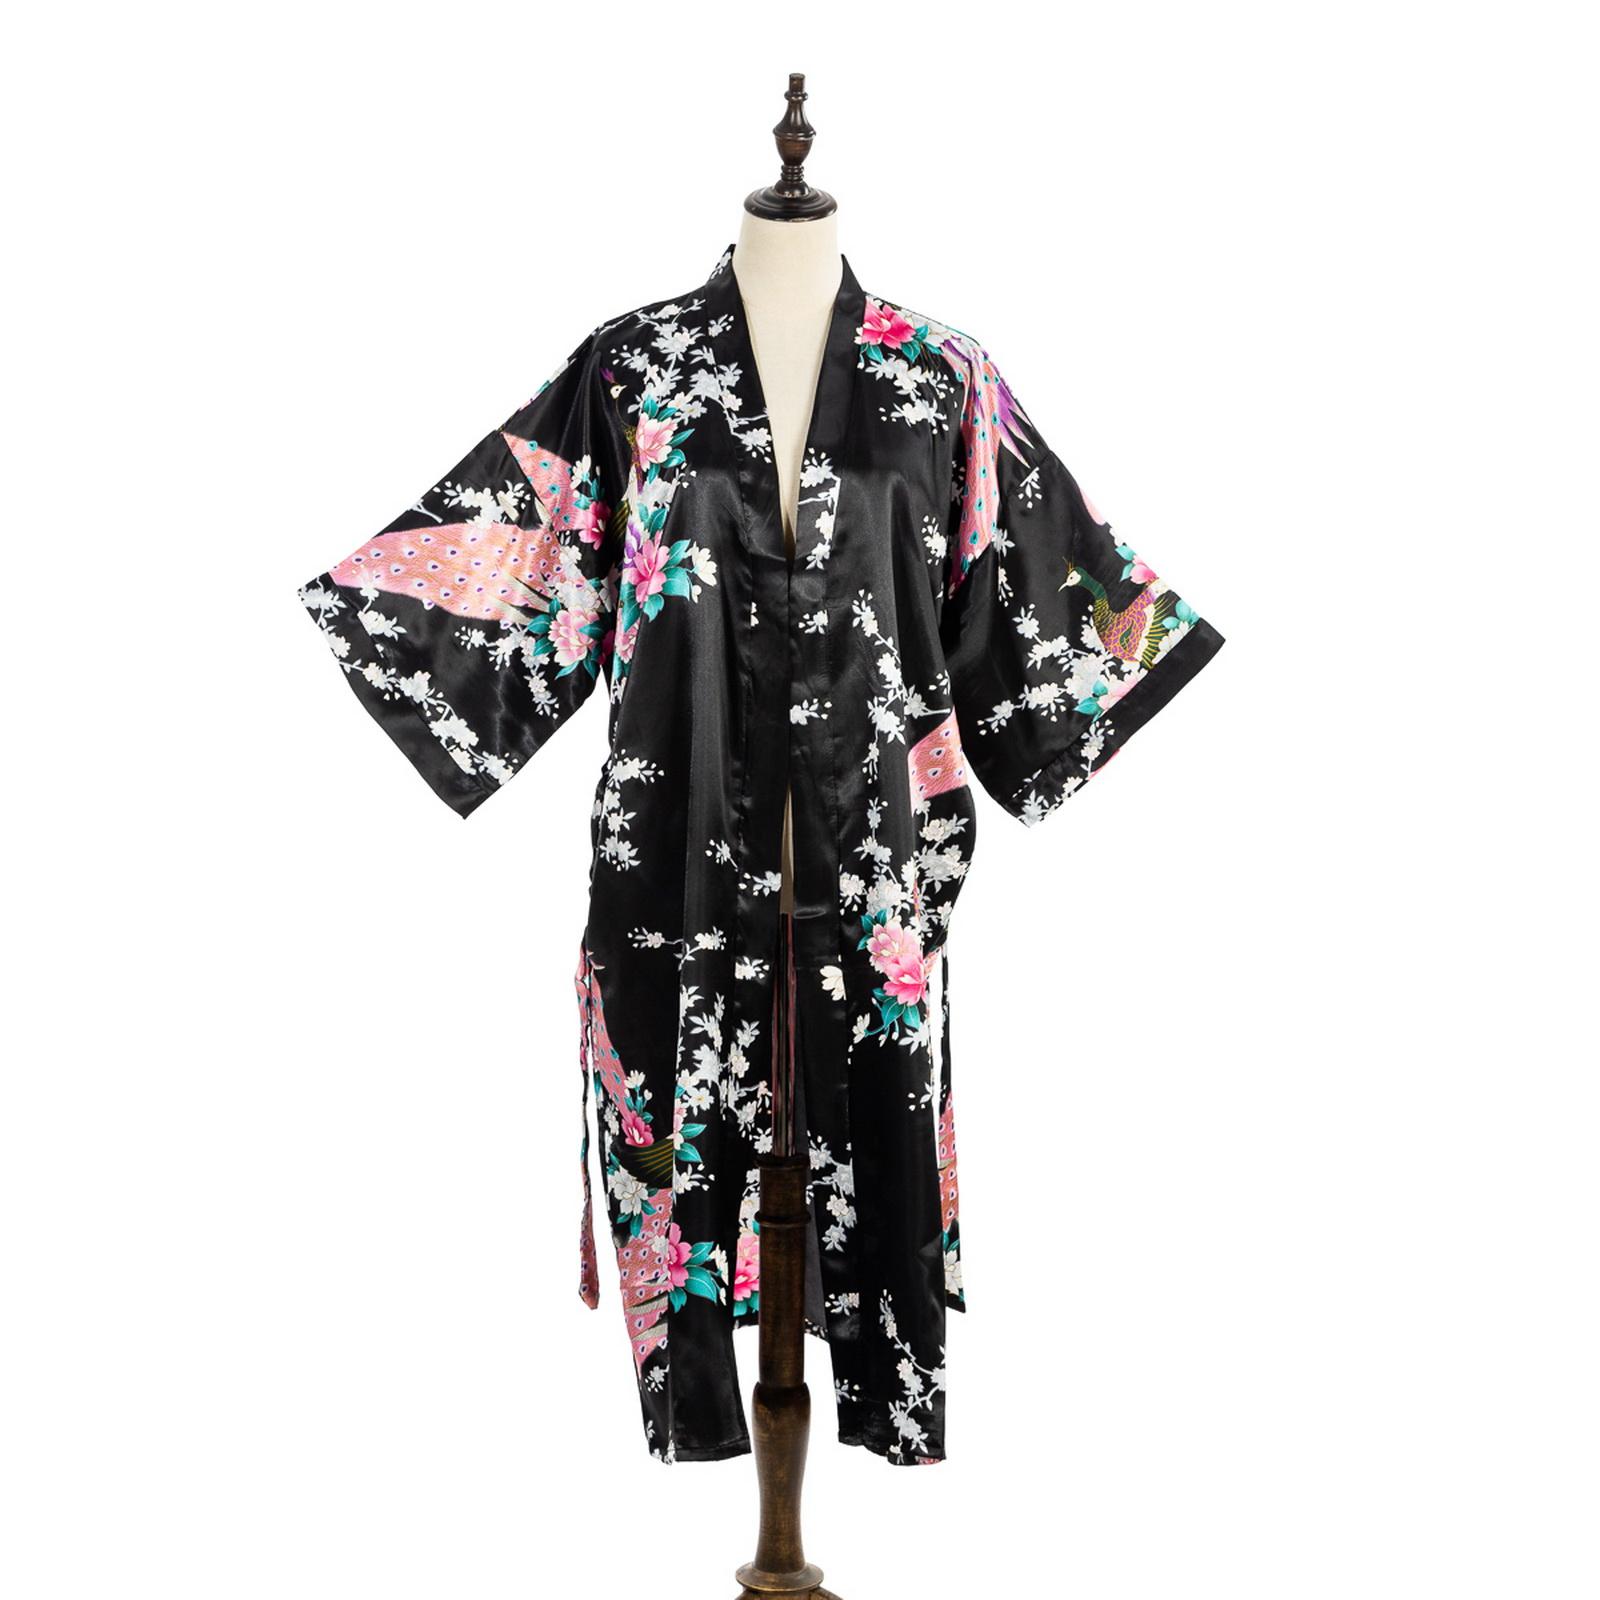 Flower Peacock Satin Silk Kimono Robe Dressing Gown Bridal Gift Black